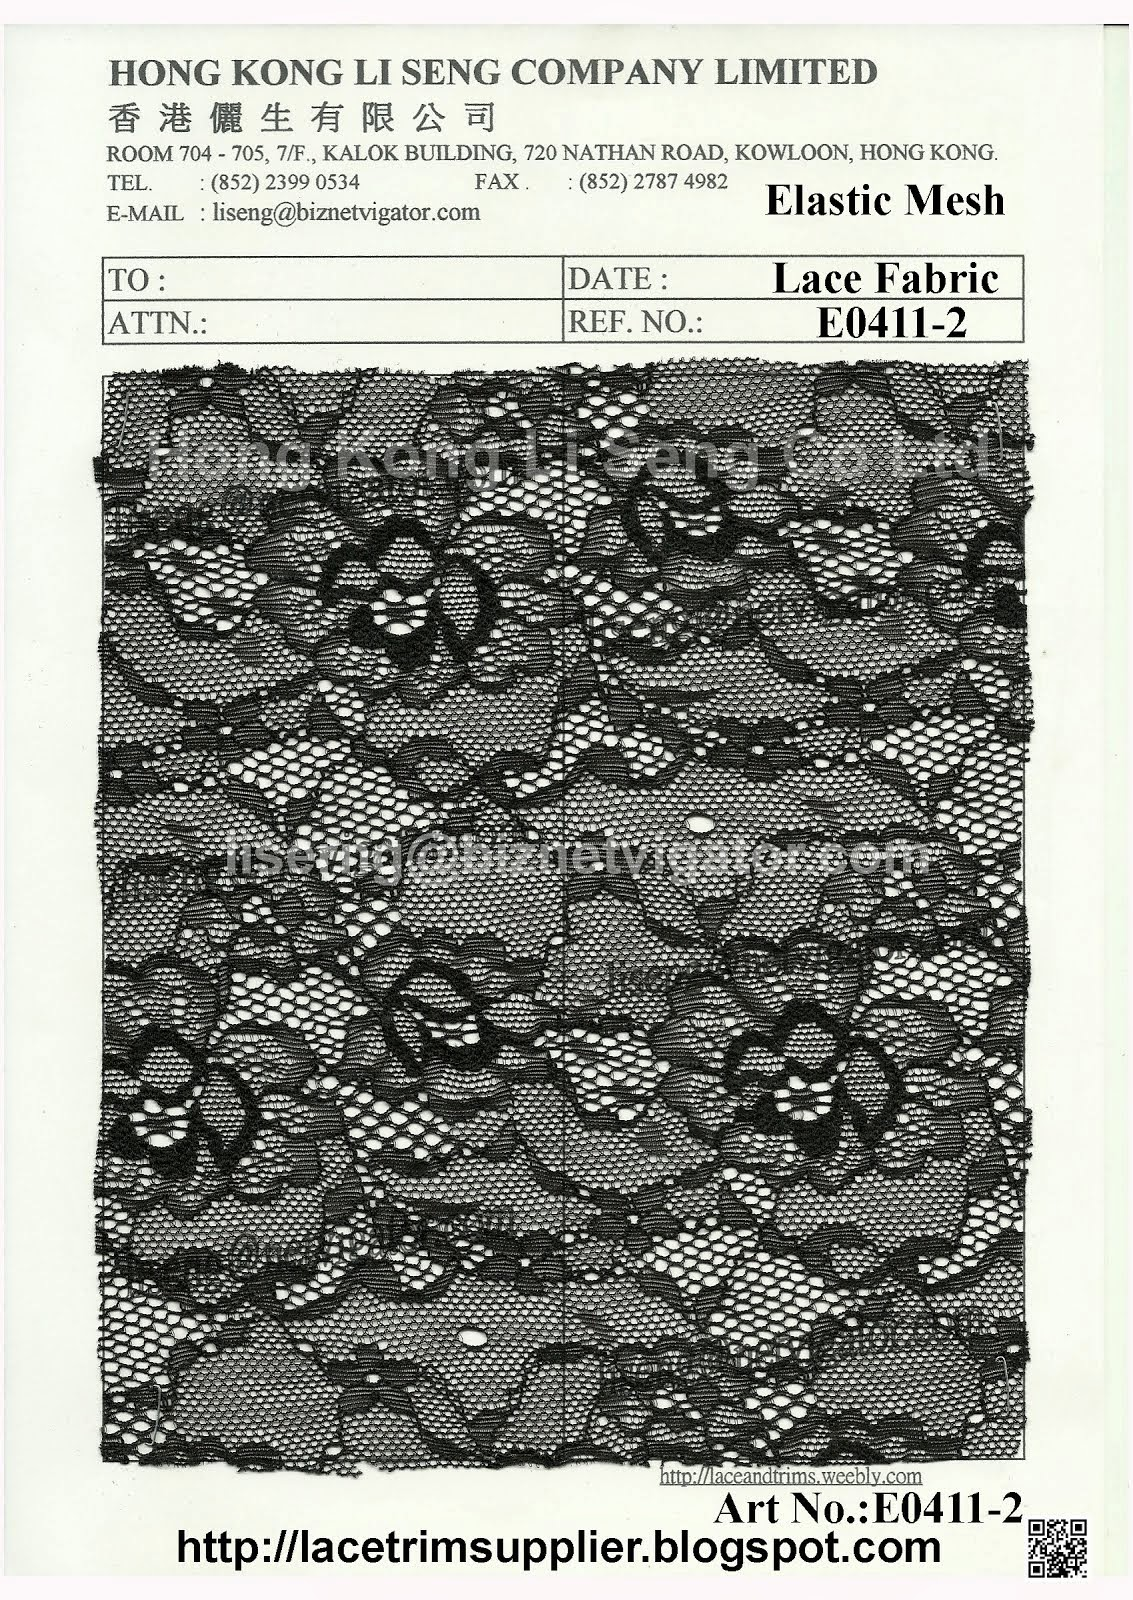 Elastic Mesh Lace Fabric Manufacturer and Supplier - Hong Kong Li Seng Co Ltd